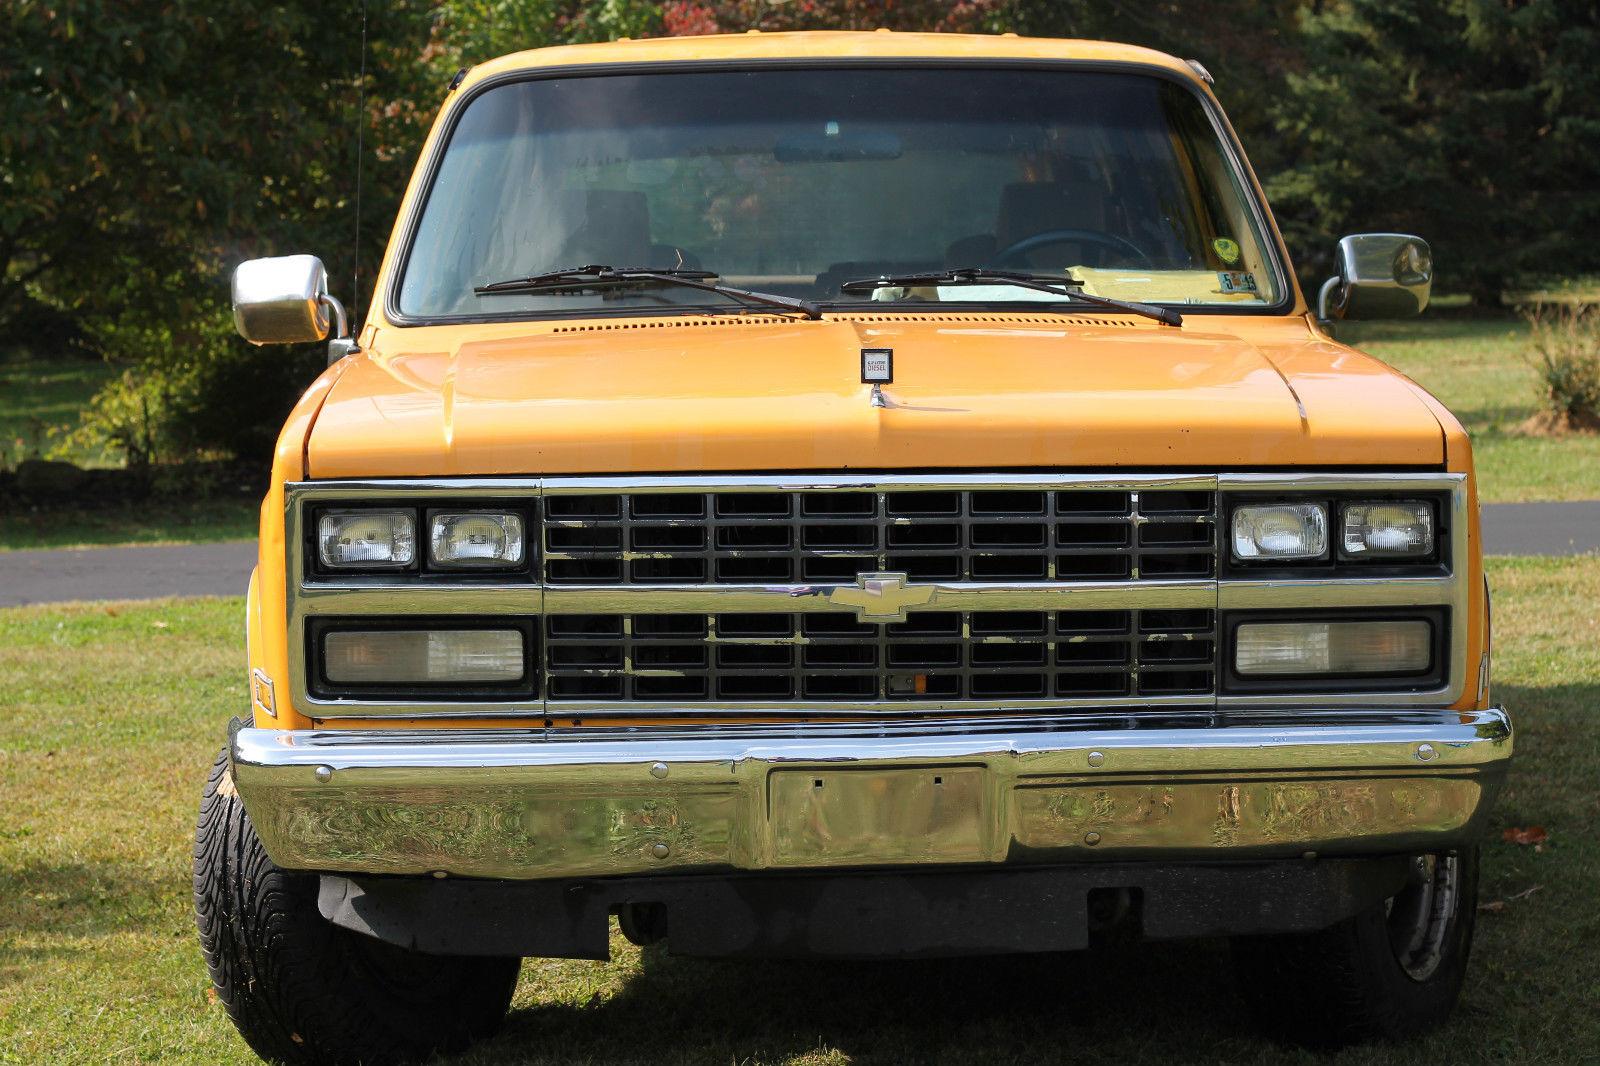 diesel chevrolet lightly used diesel engine suburban 1500 transmission classic chevrolet. Black Bedroom Furniture Sets. Home Design Ideas